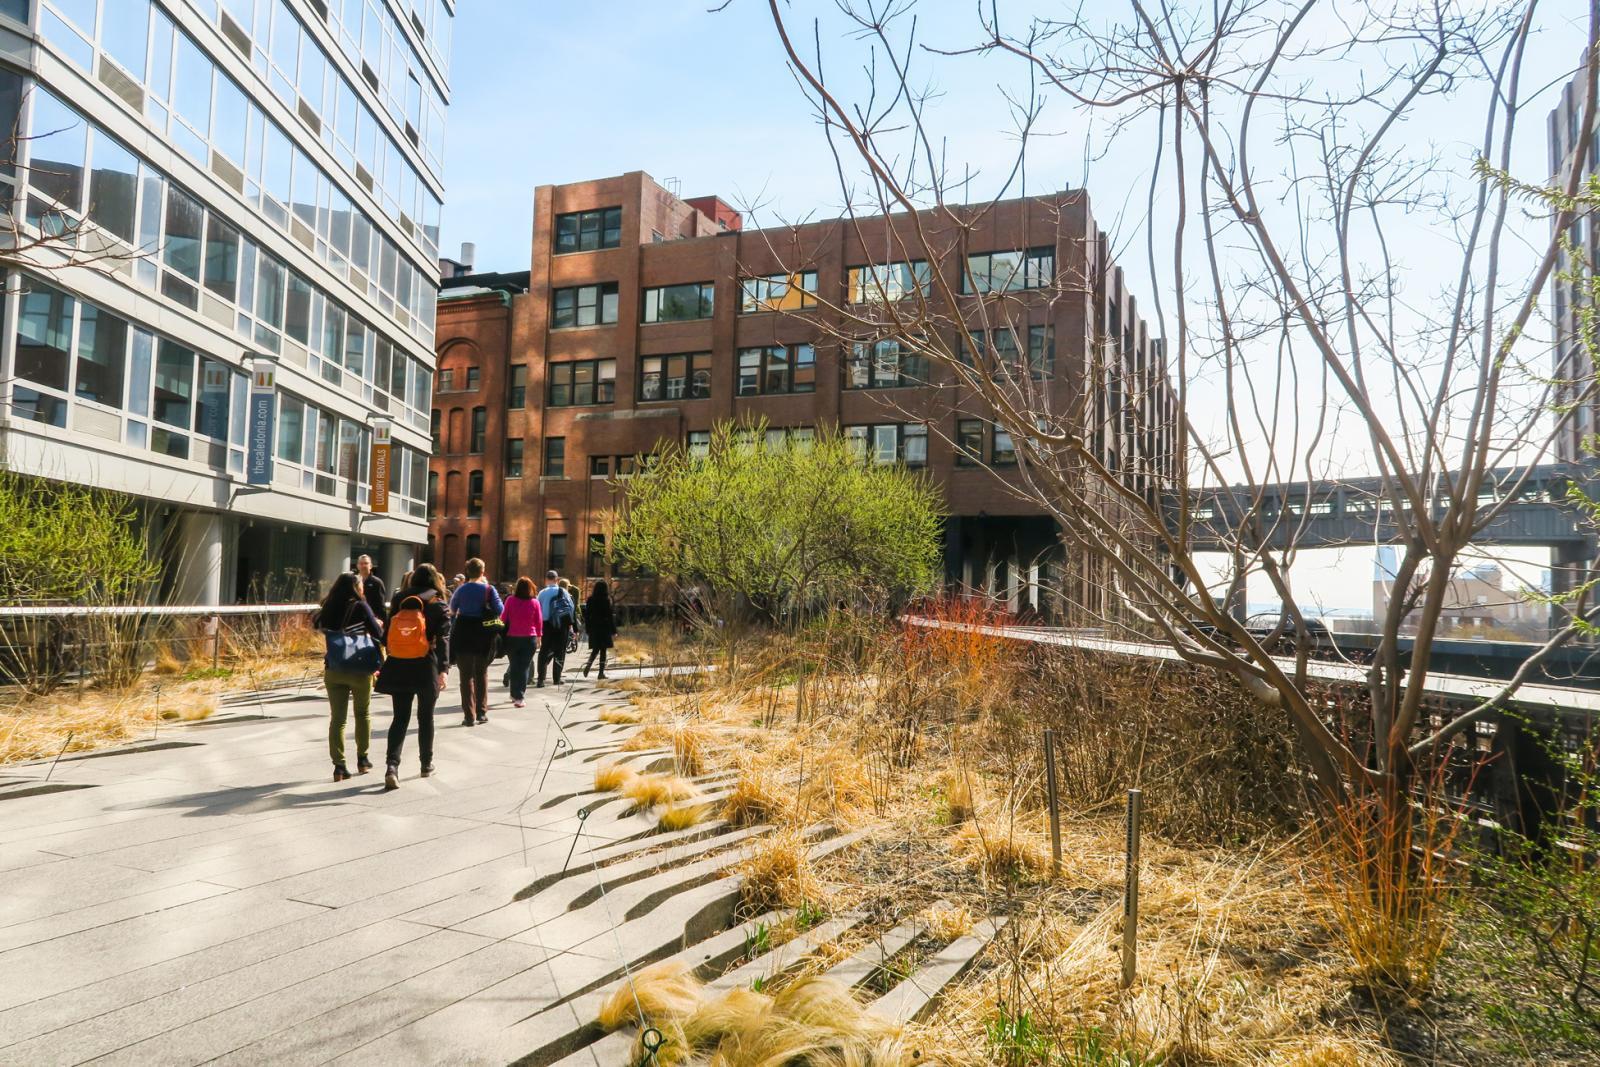 Take a walk along the High Line